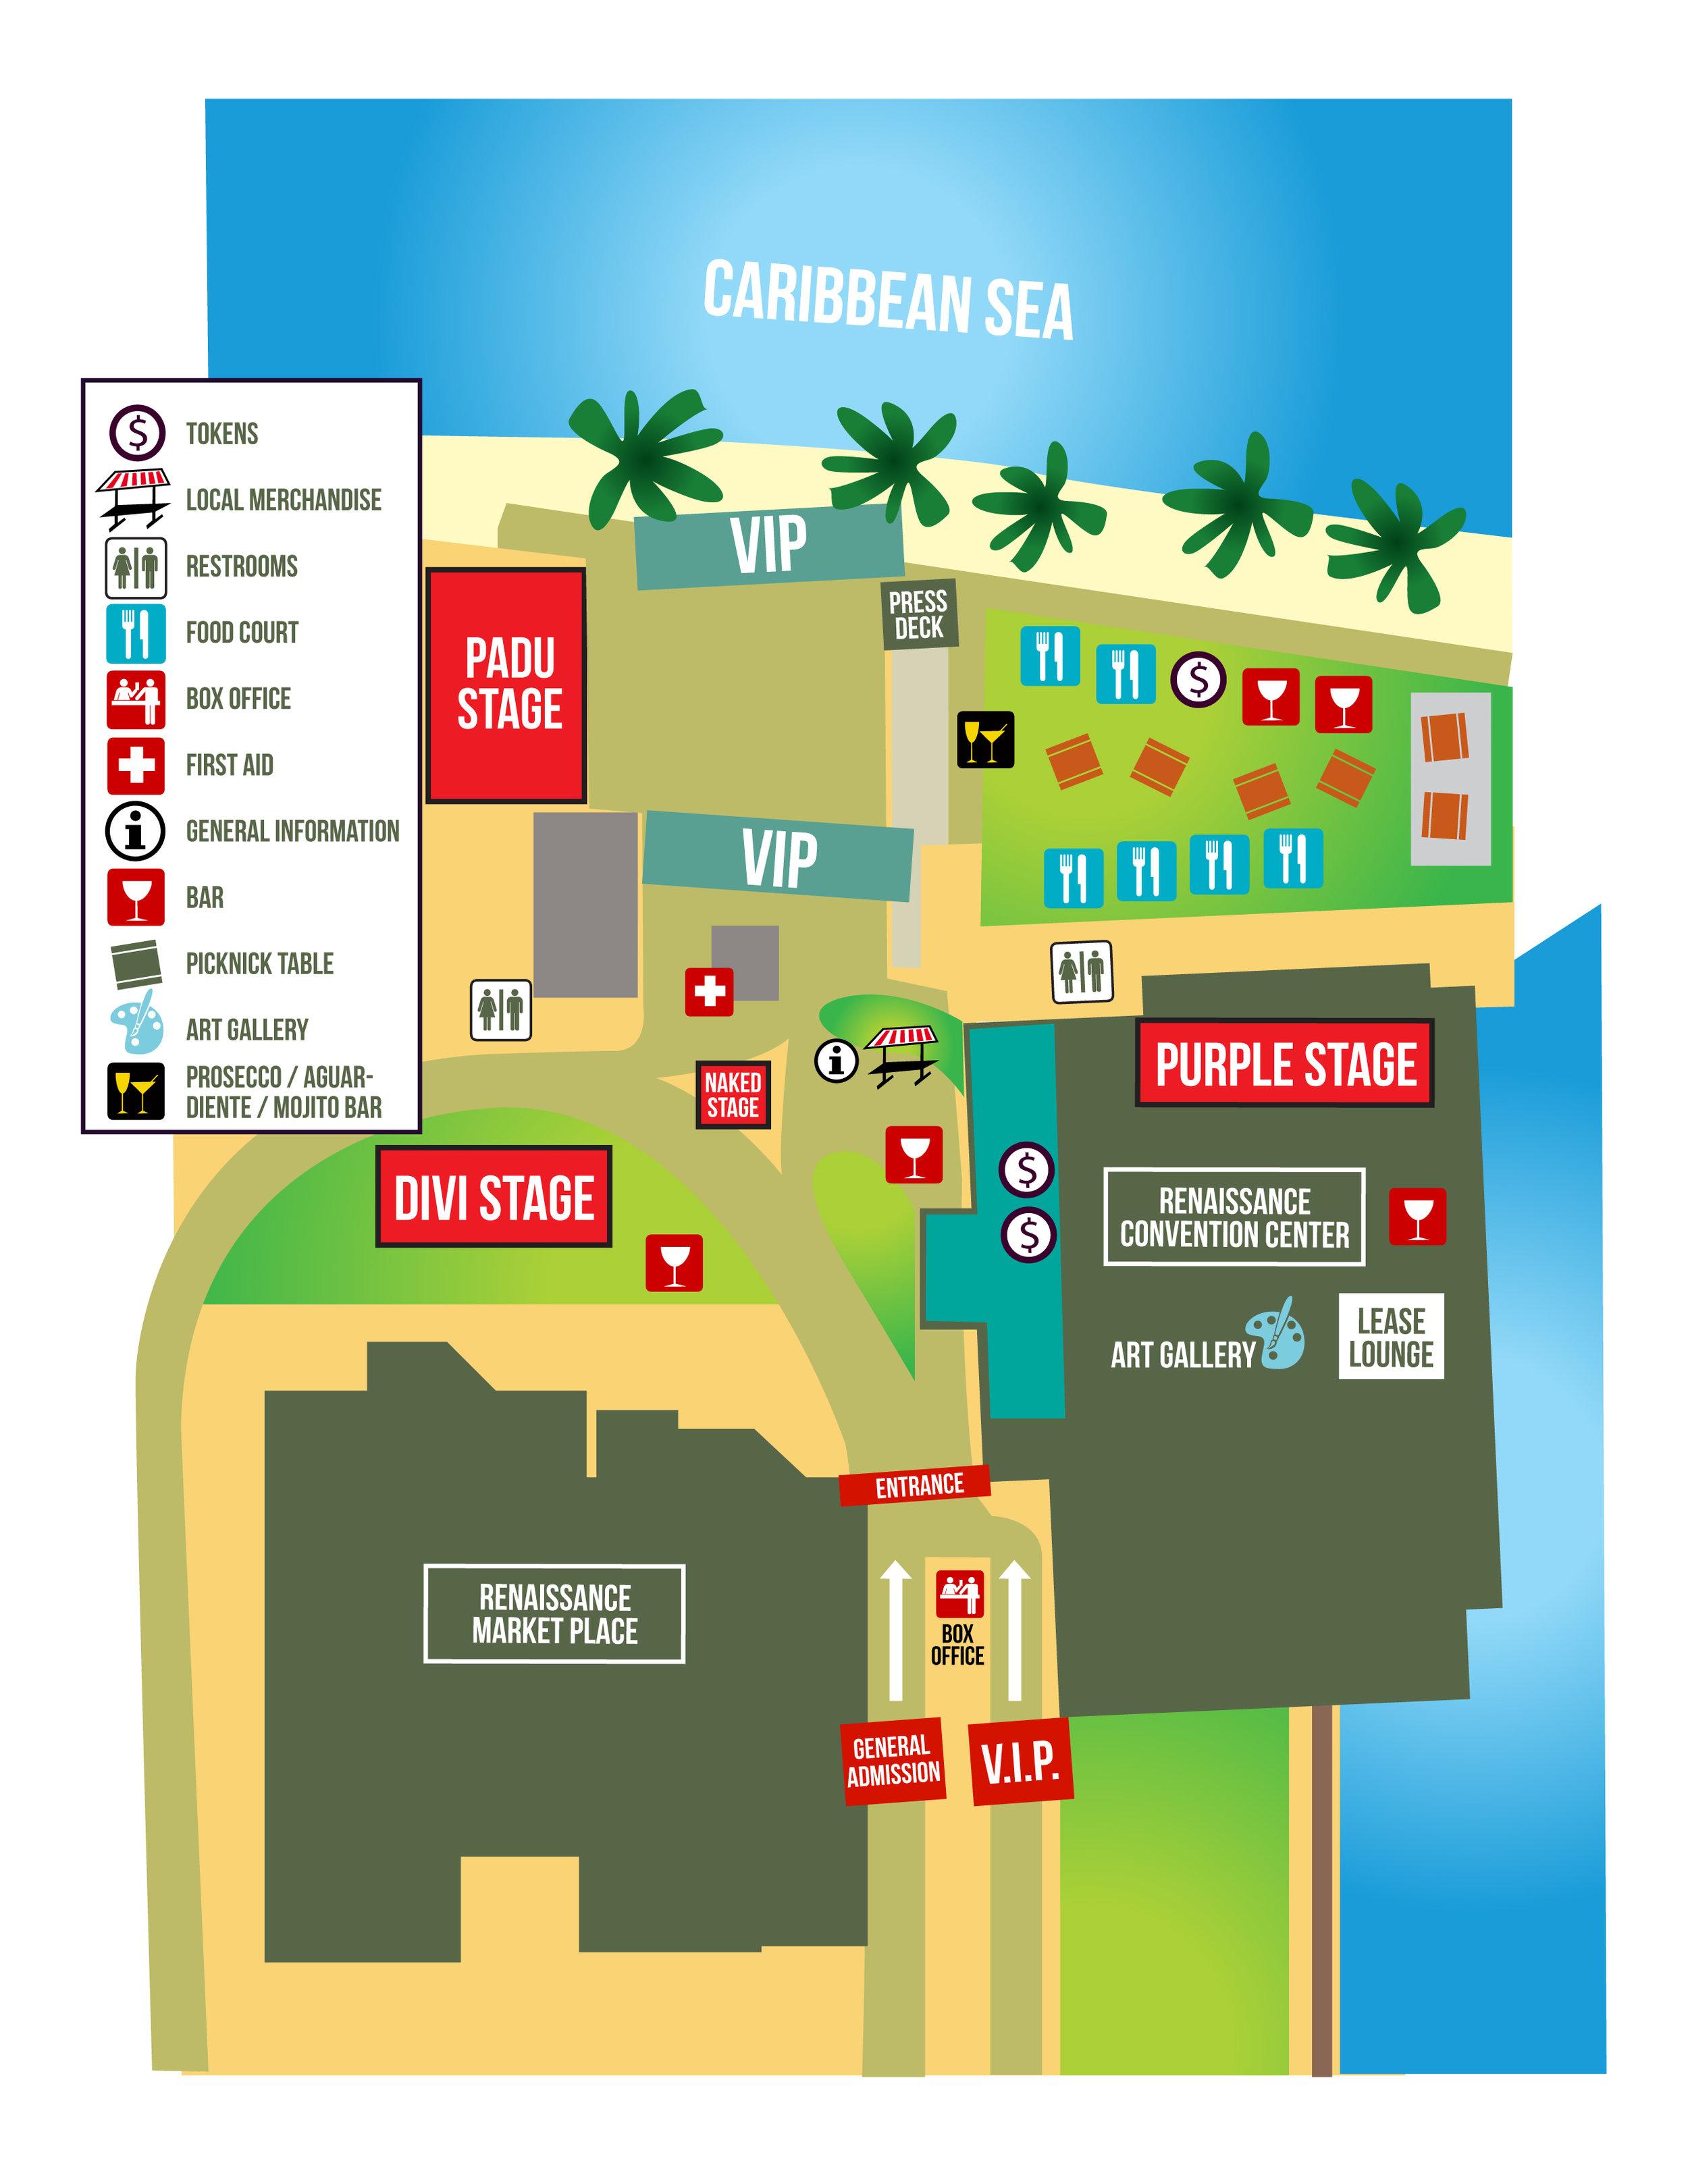 The venue floorplan